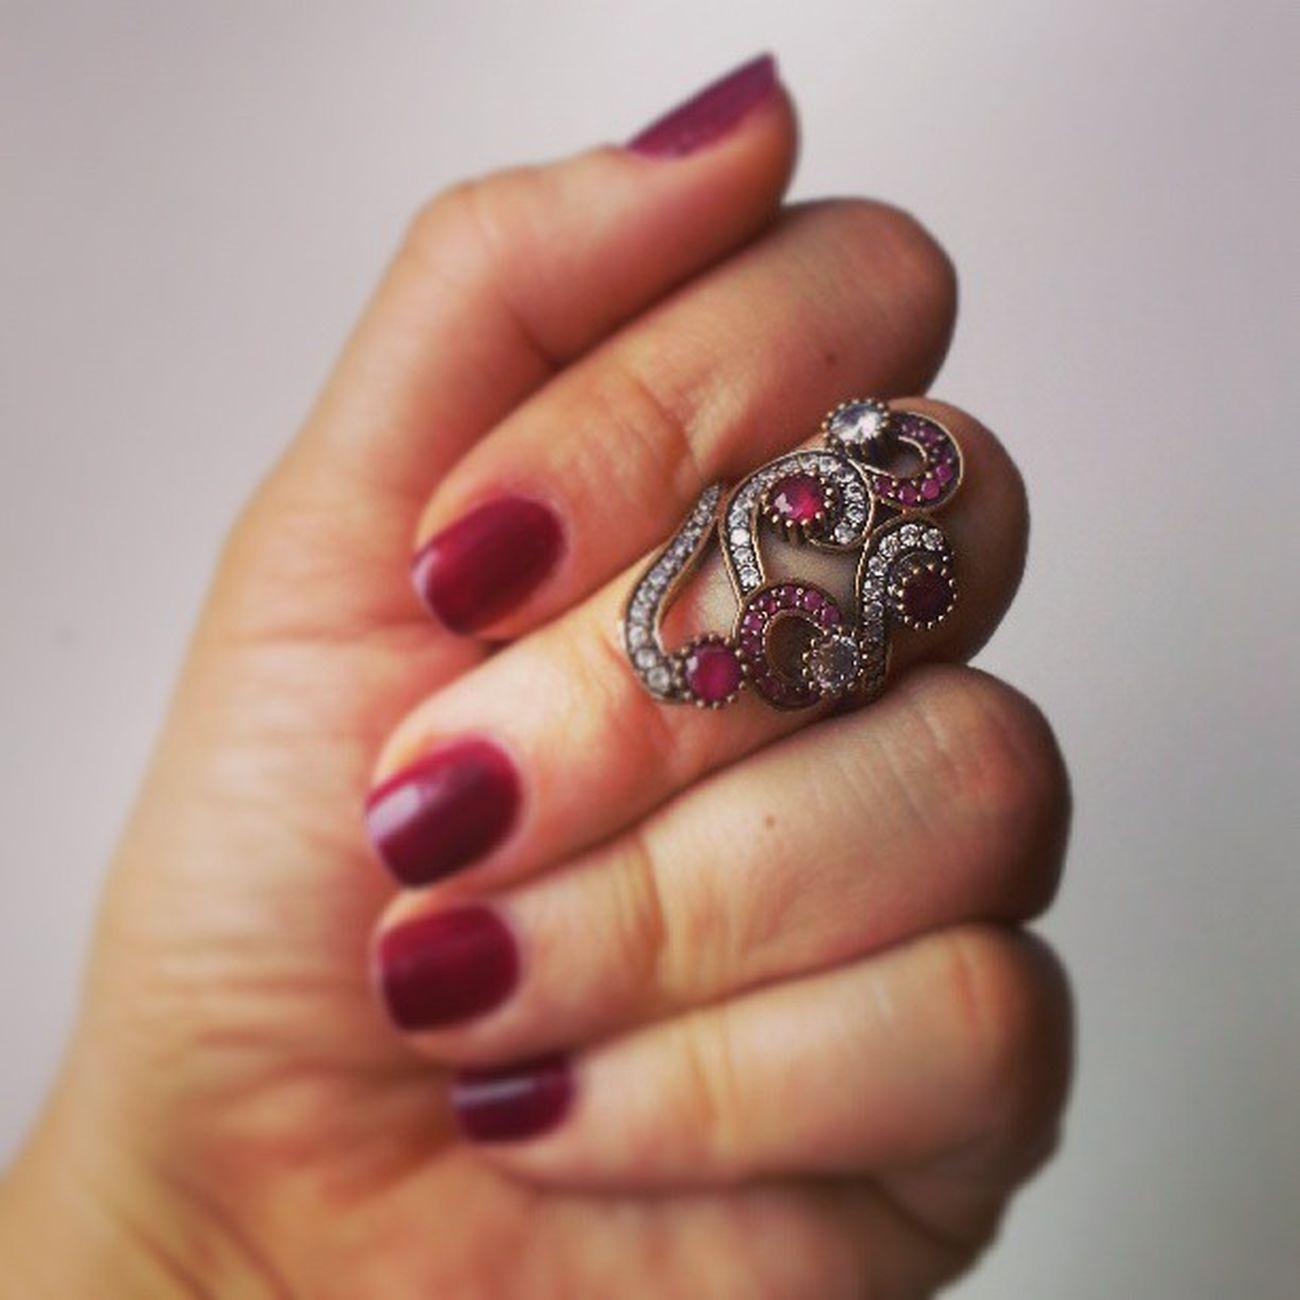 Midi Yüzük :) Midirings Instagram Instagramania Instapod Instaturk Jeweller Jewelry Instagramania Instamood Instagood Instajewelery Fashioninsta Instafashion Moda Taki Mtgelite